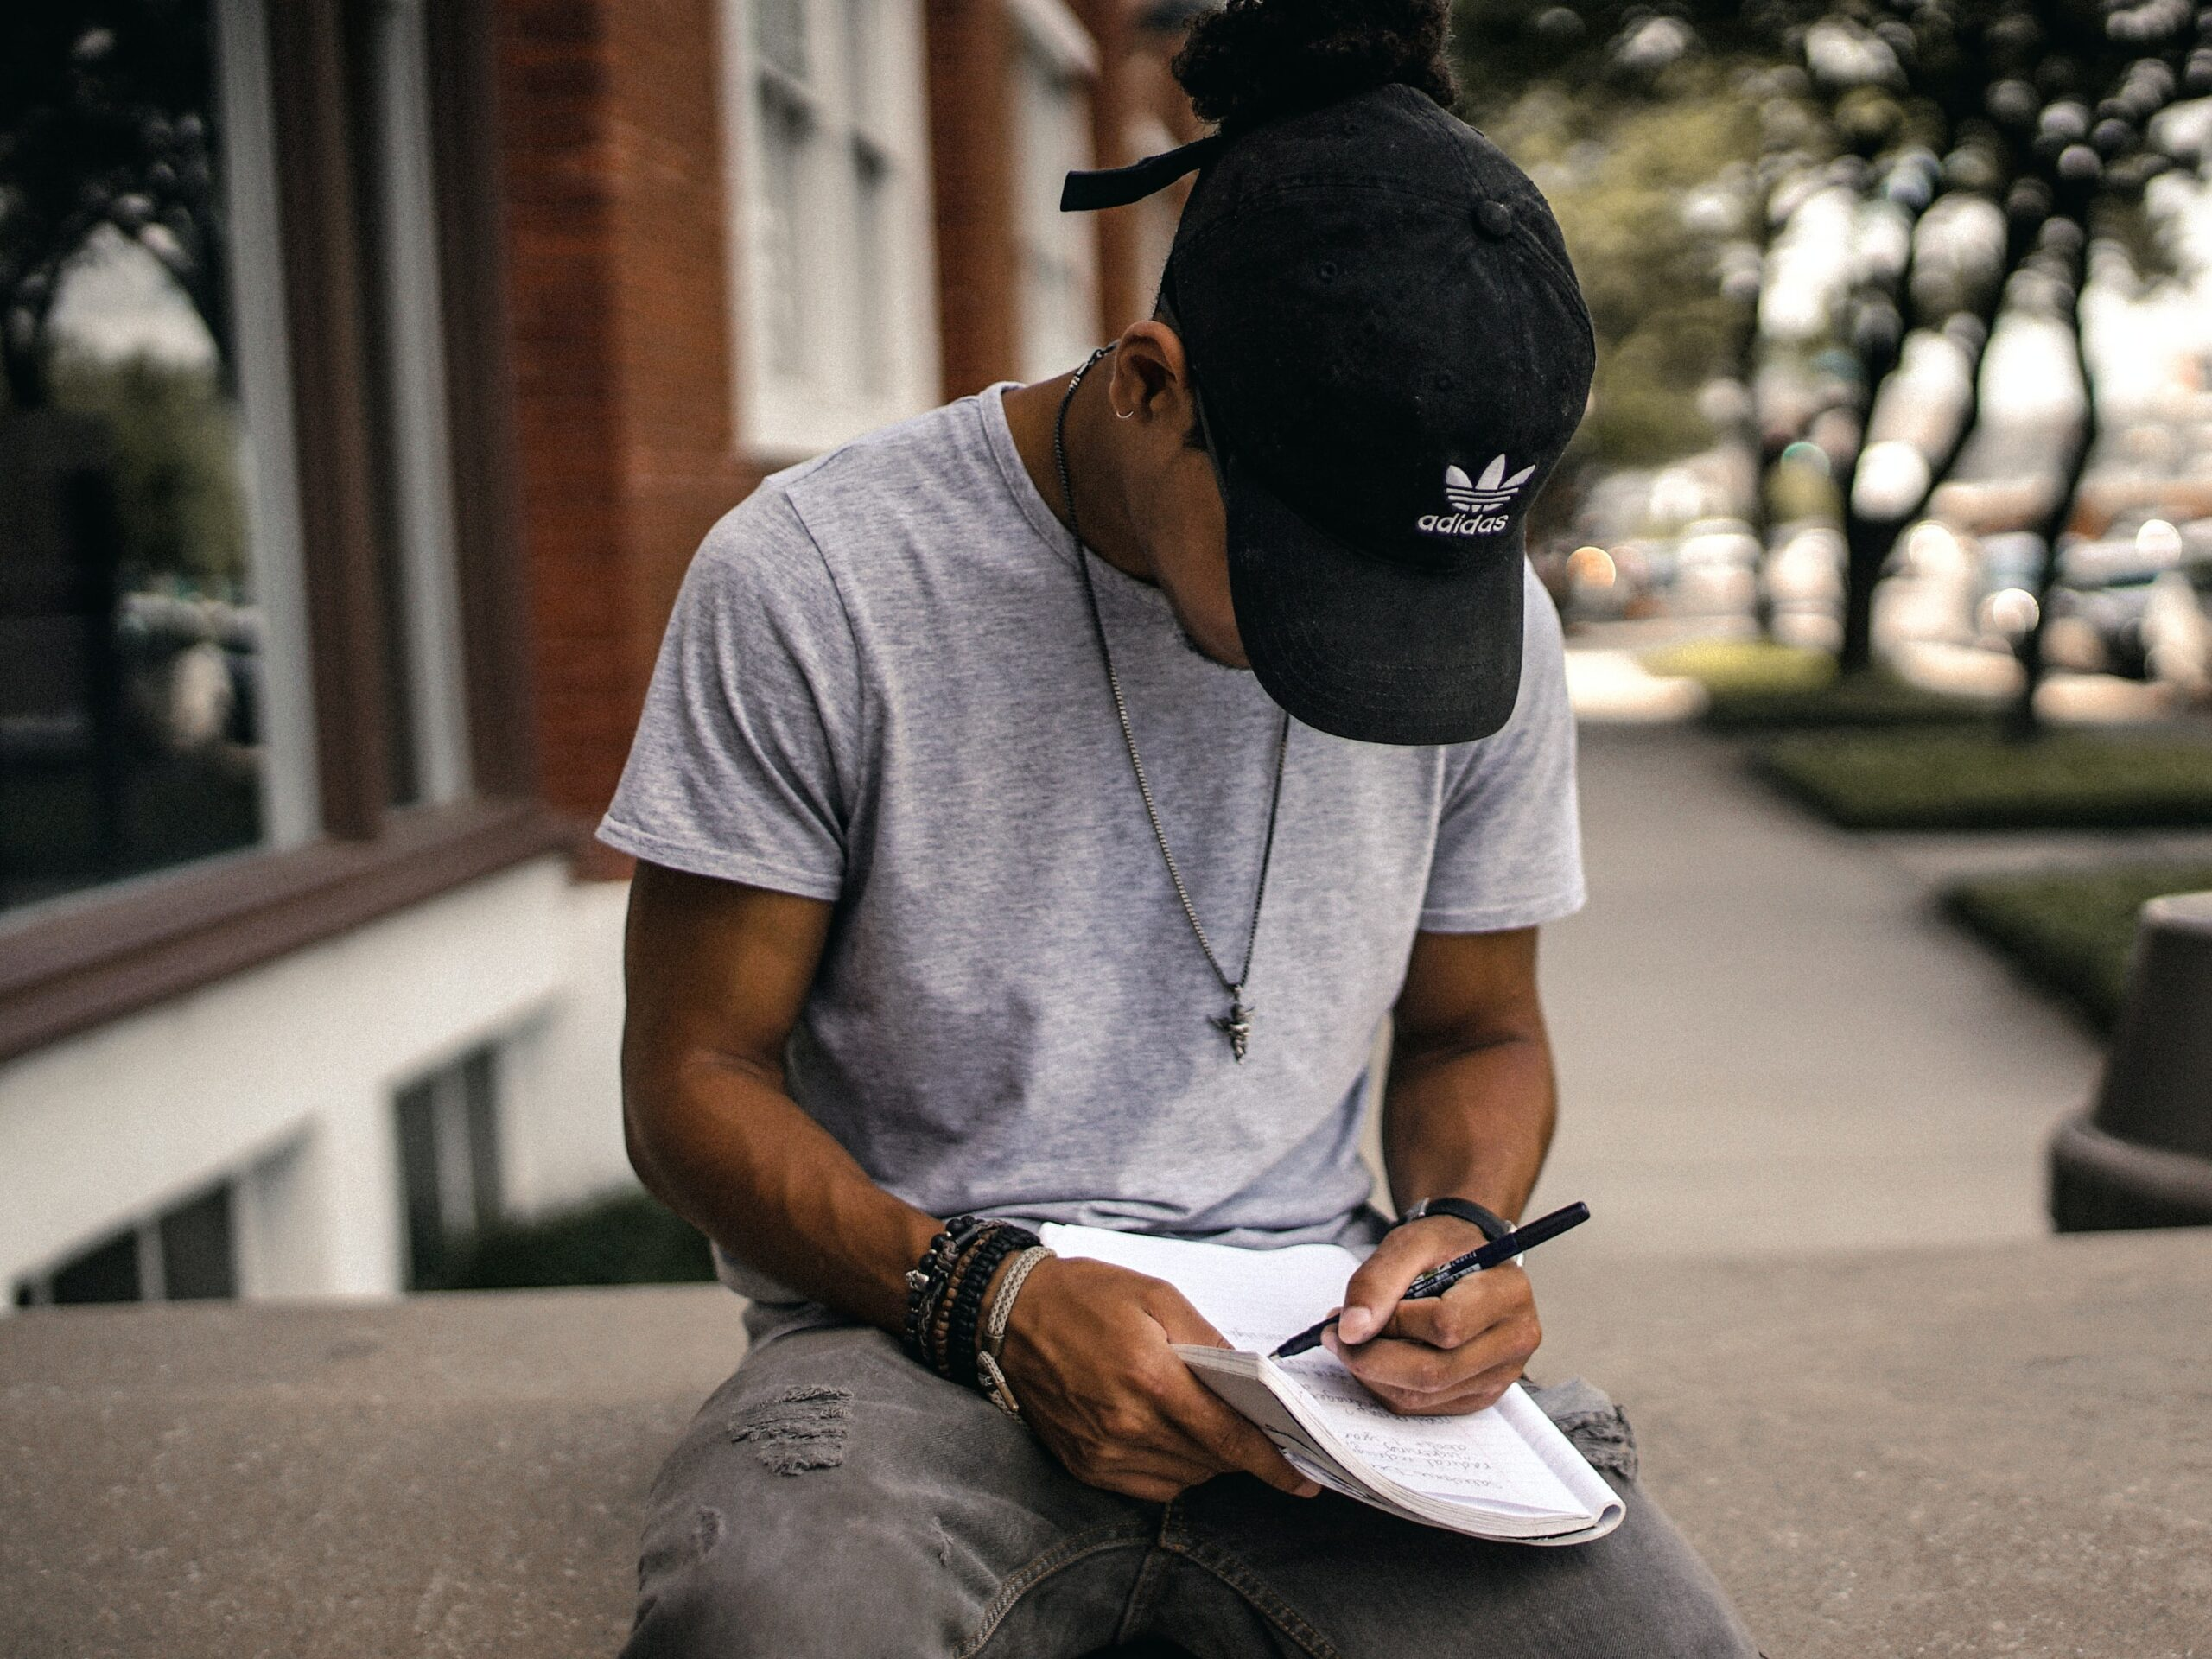 brad-neathery-Student taking notes-unsplash